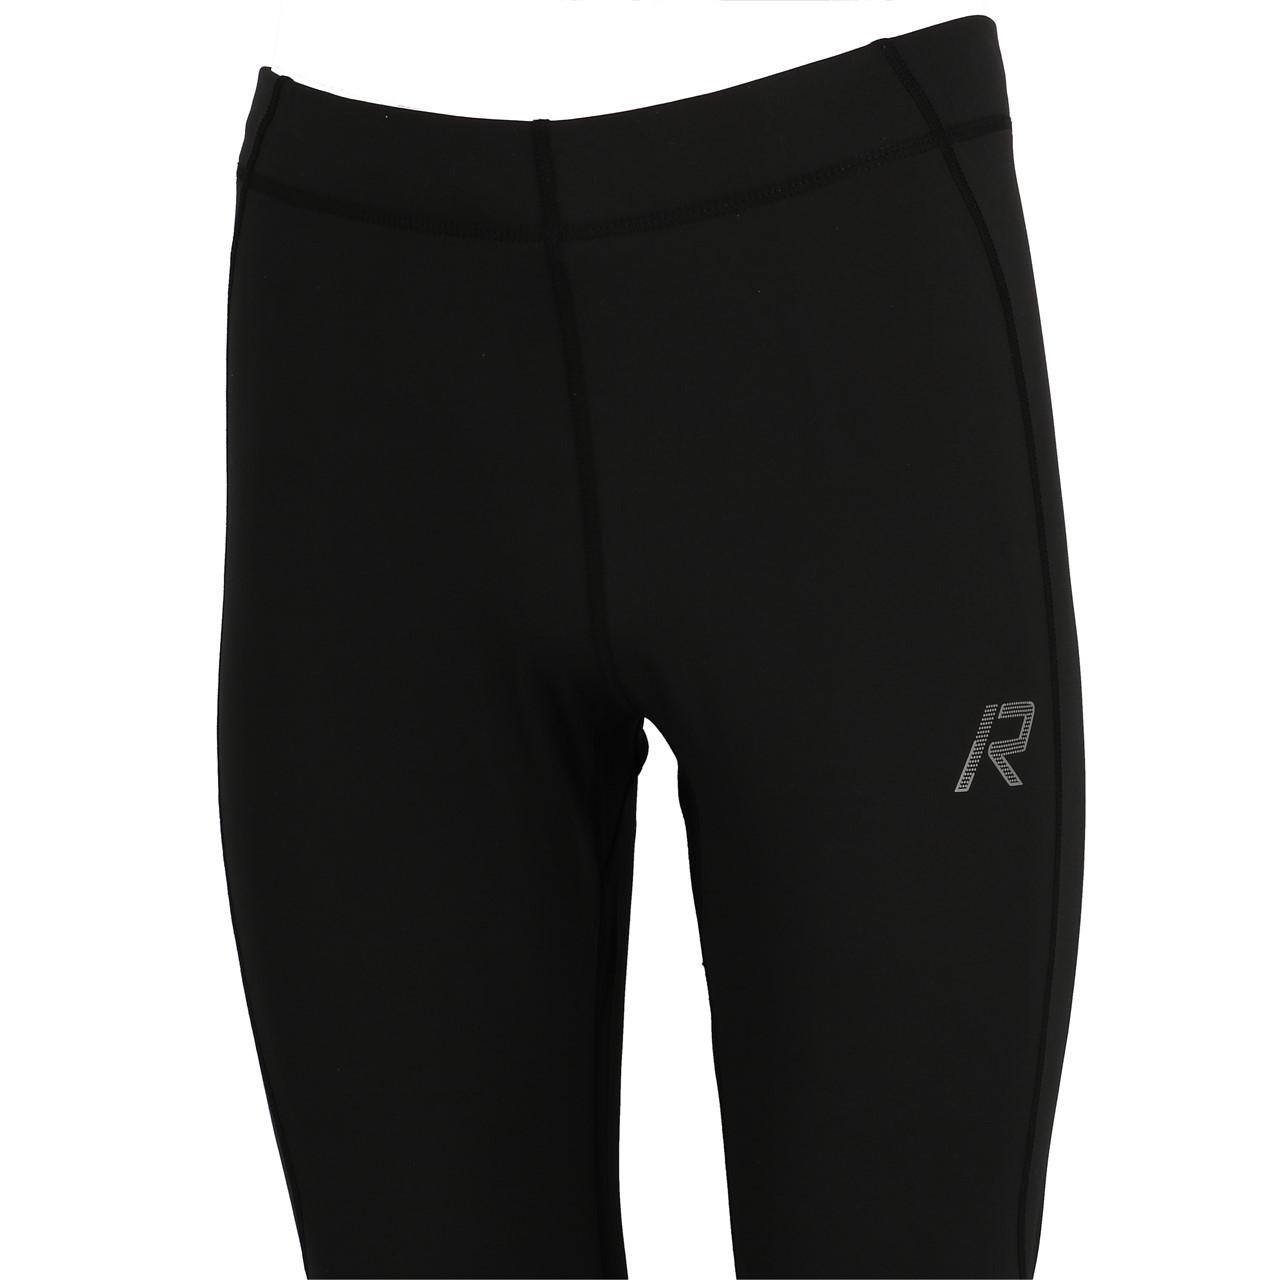 Legging-Sport-Rukka-Jonah-Blk-Tight-Run-Schwarz-25715-Neu Indexbild 4